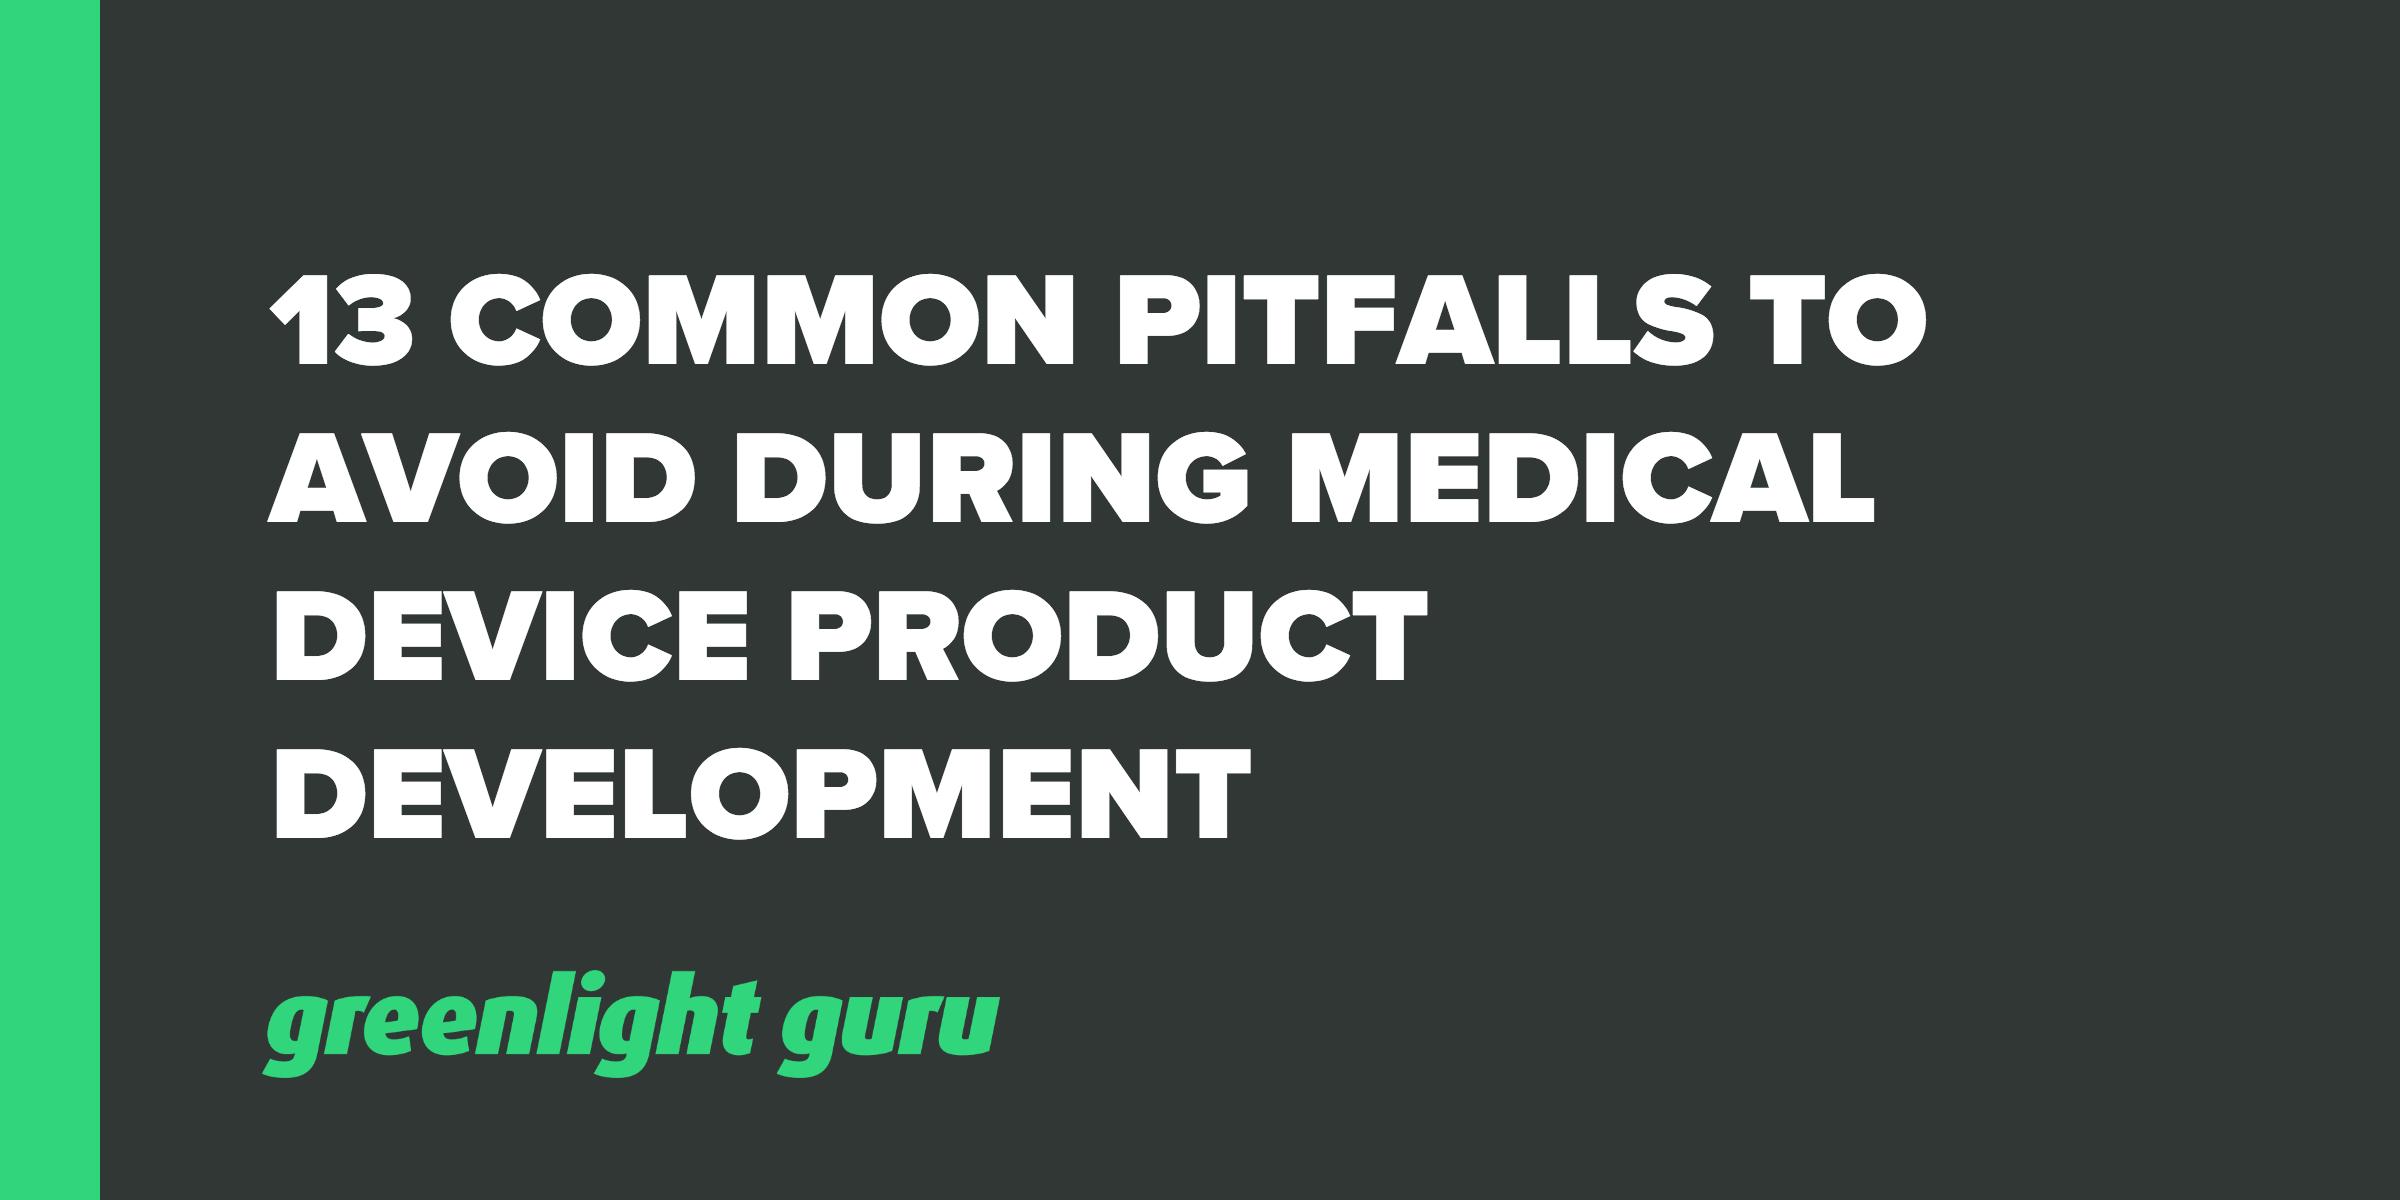 13 pitfalls